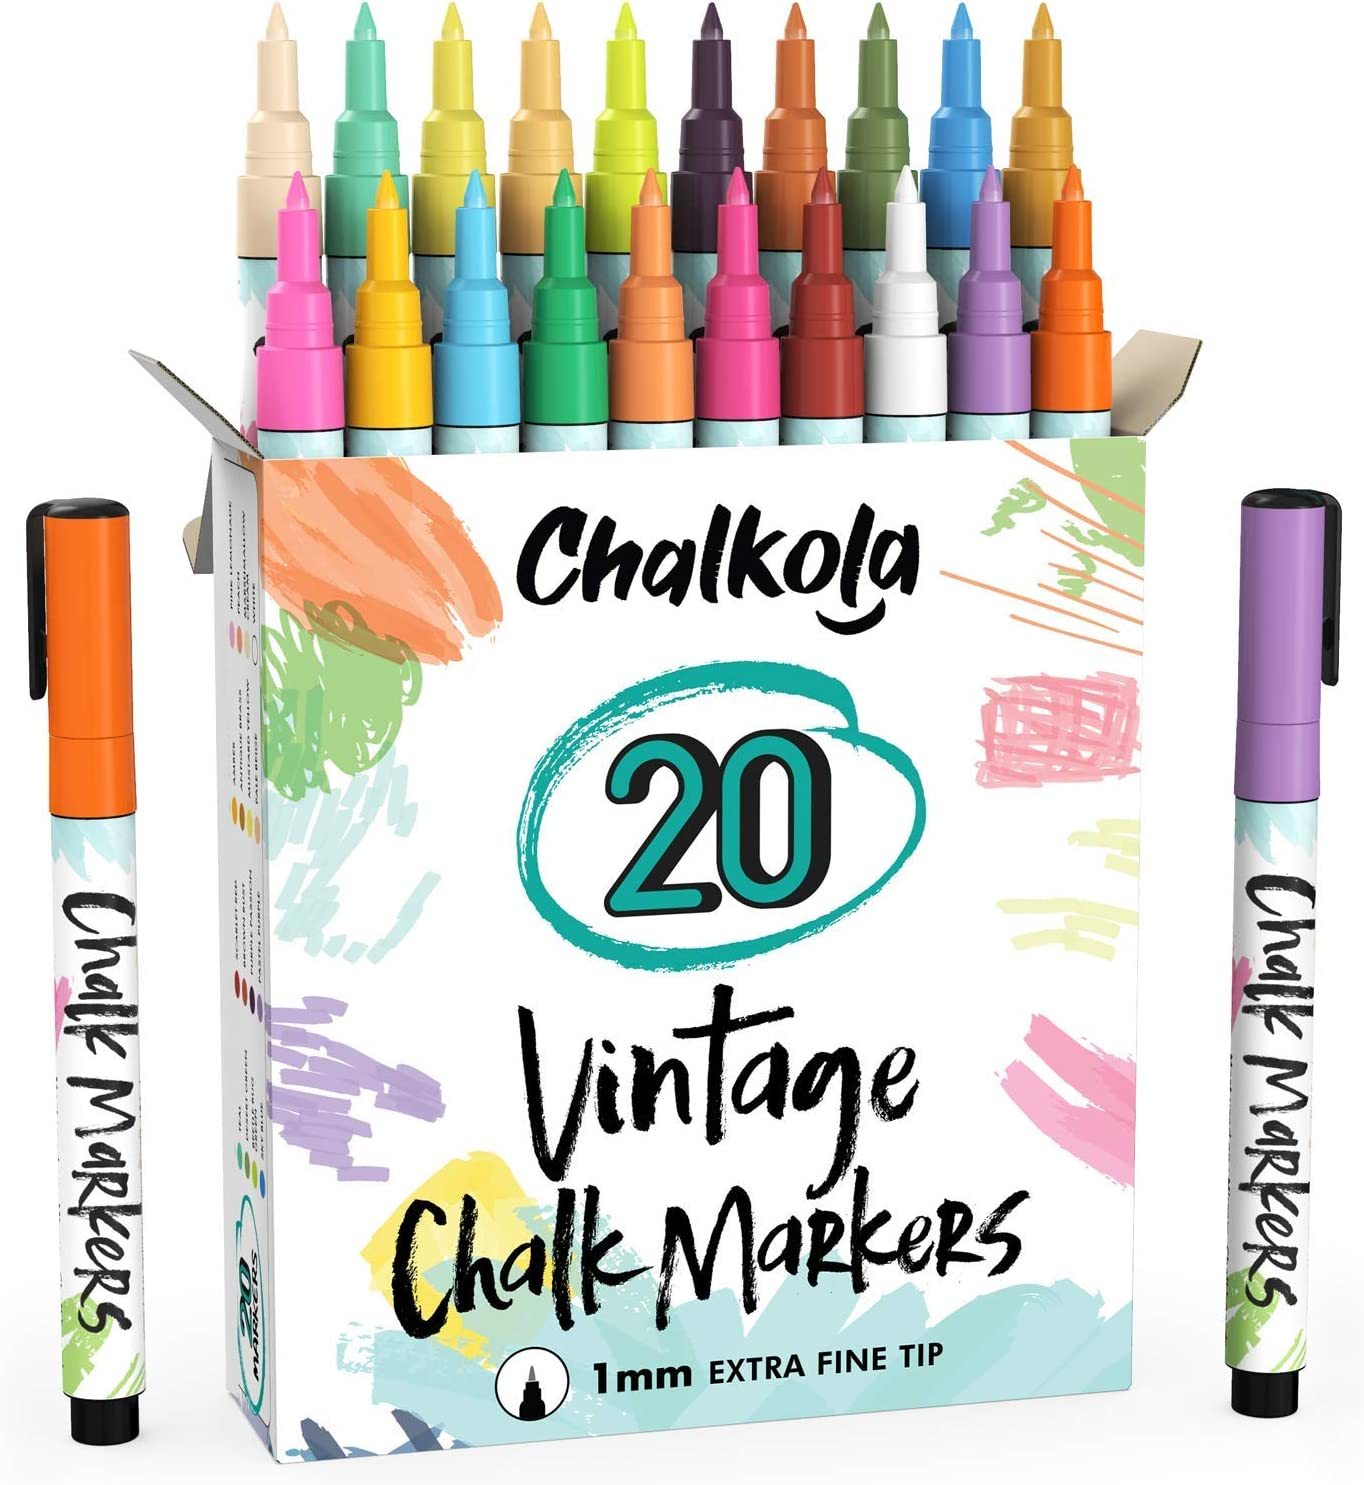 Japan's largest assortment Extra Fine Tip Liquid Regular discount Chalk Markers Chalkboard 20 C for Vintage